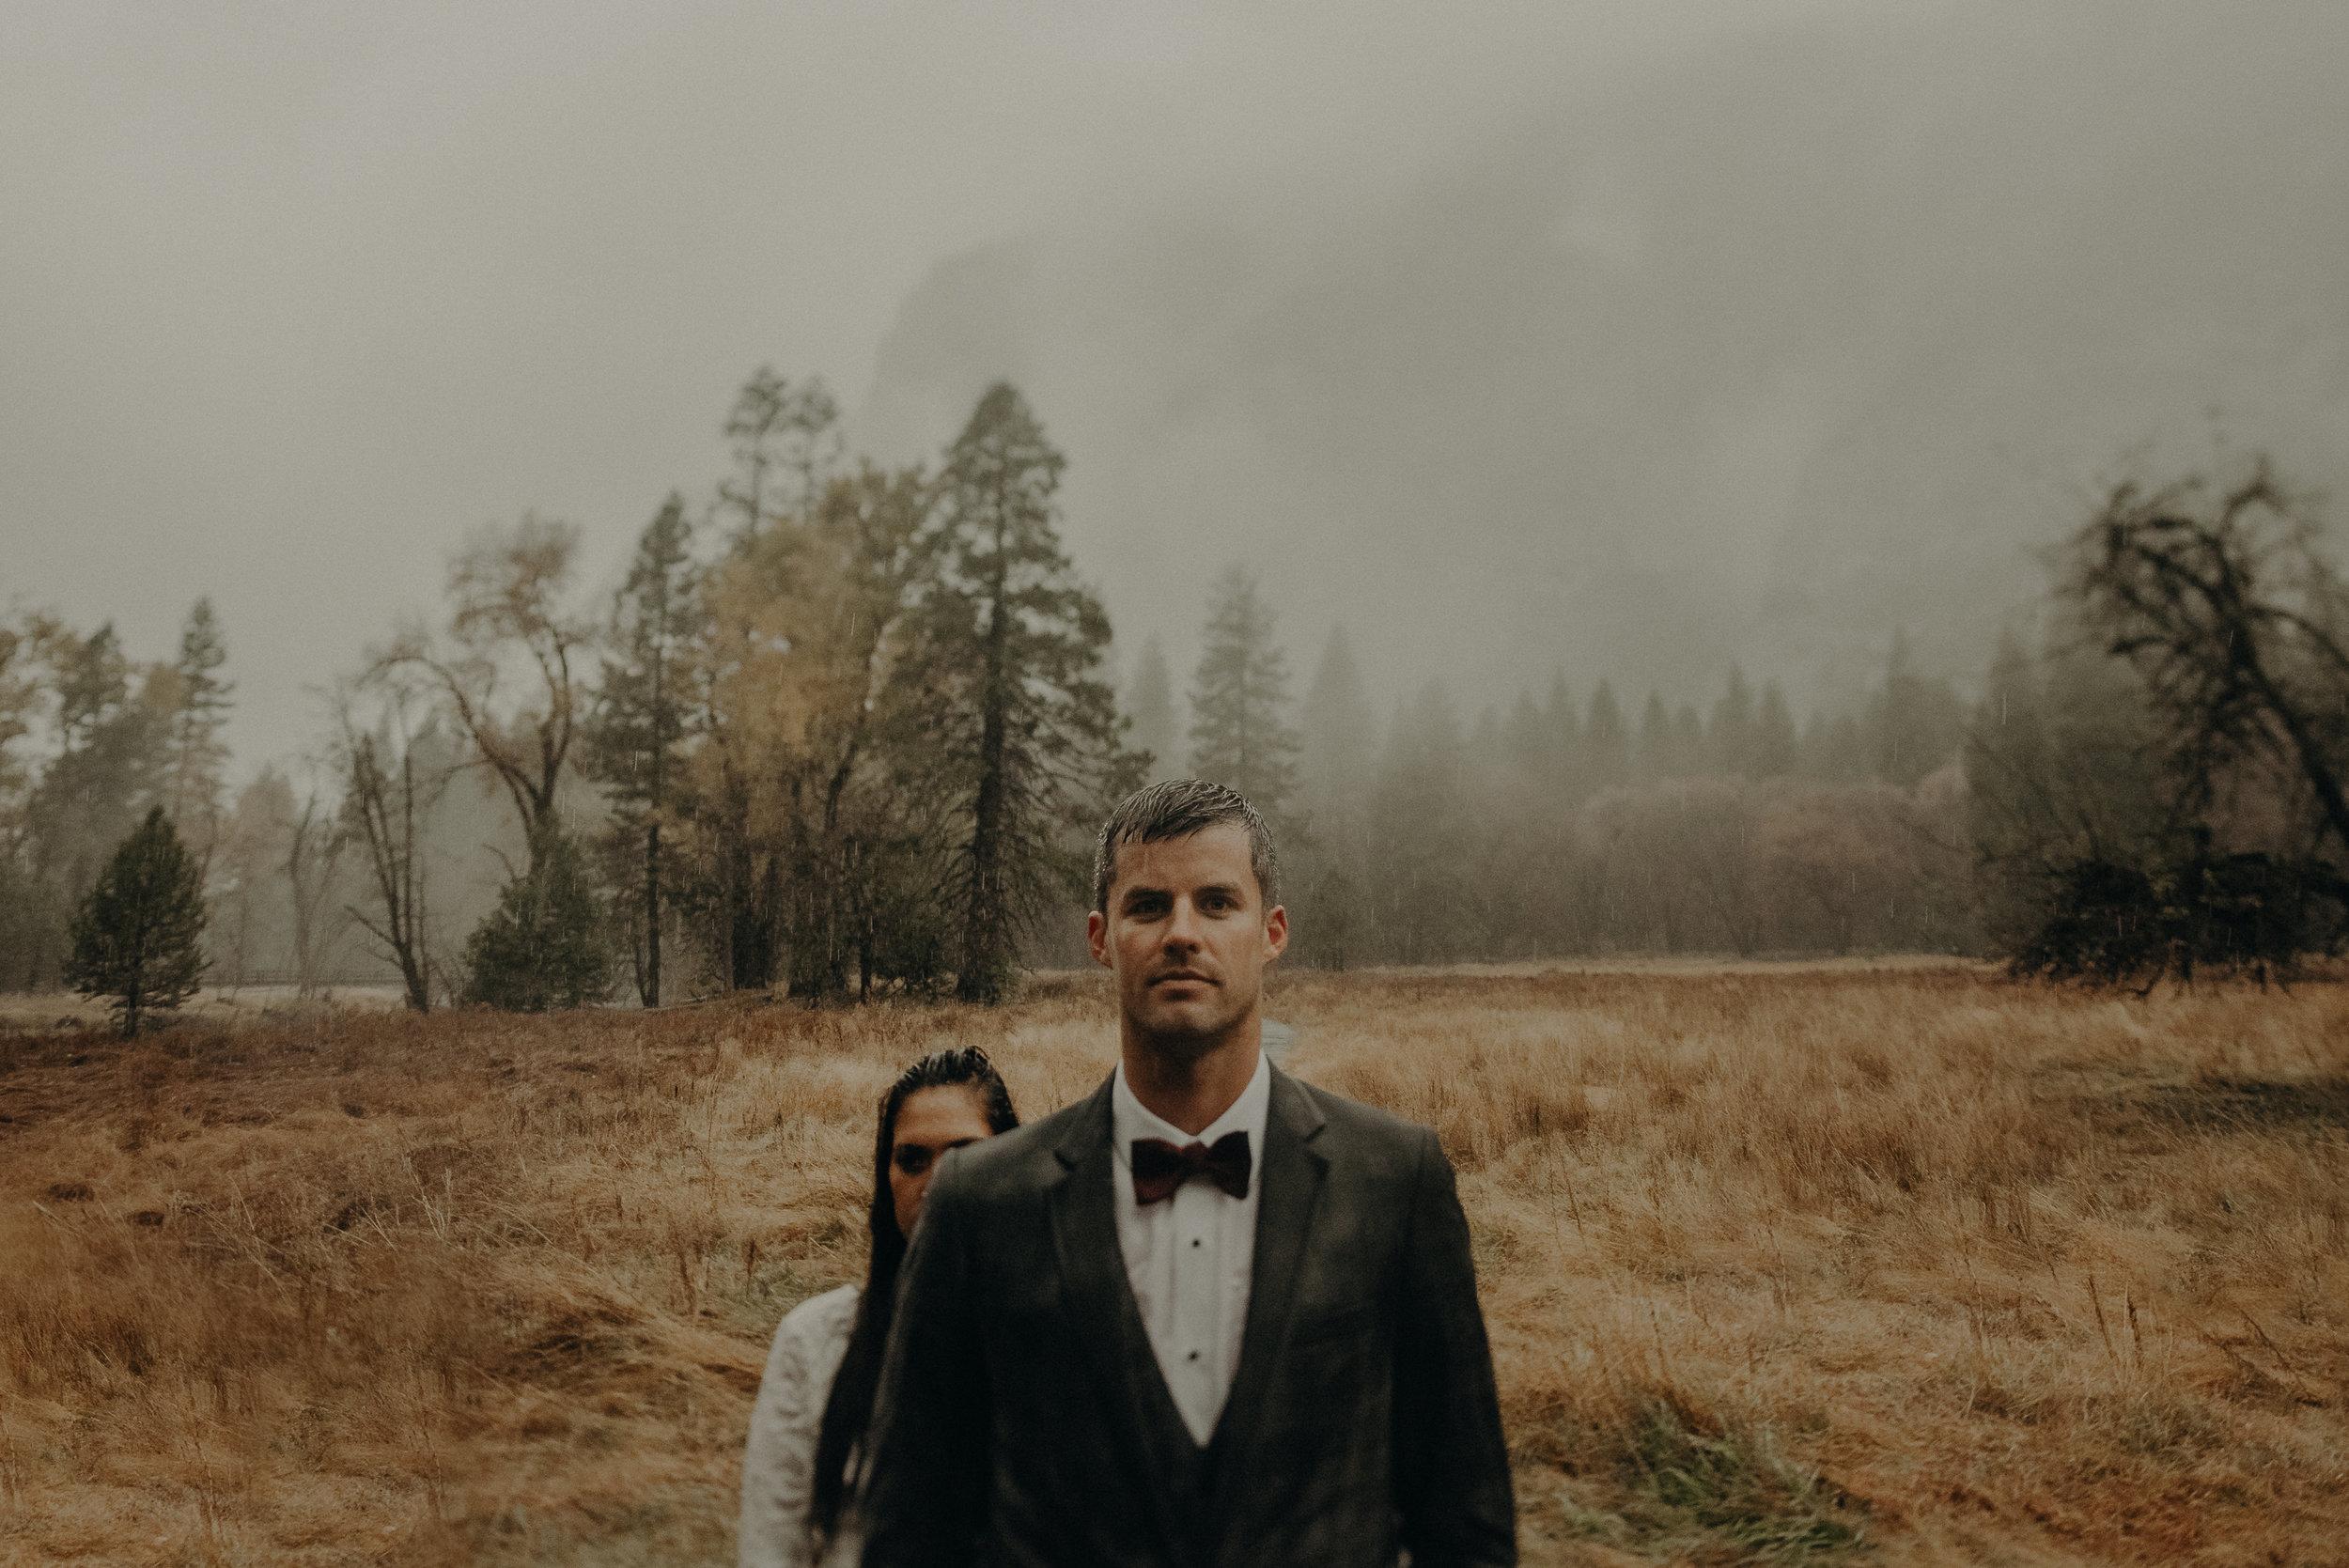 Isaiah + Taylor Photography - Yosemite Elopement - Los Angeles Wedding Photographer-77.jpg